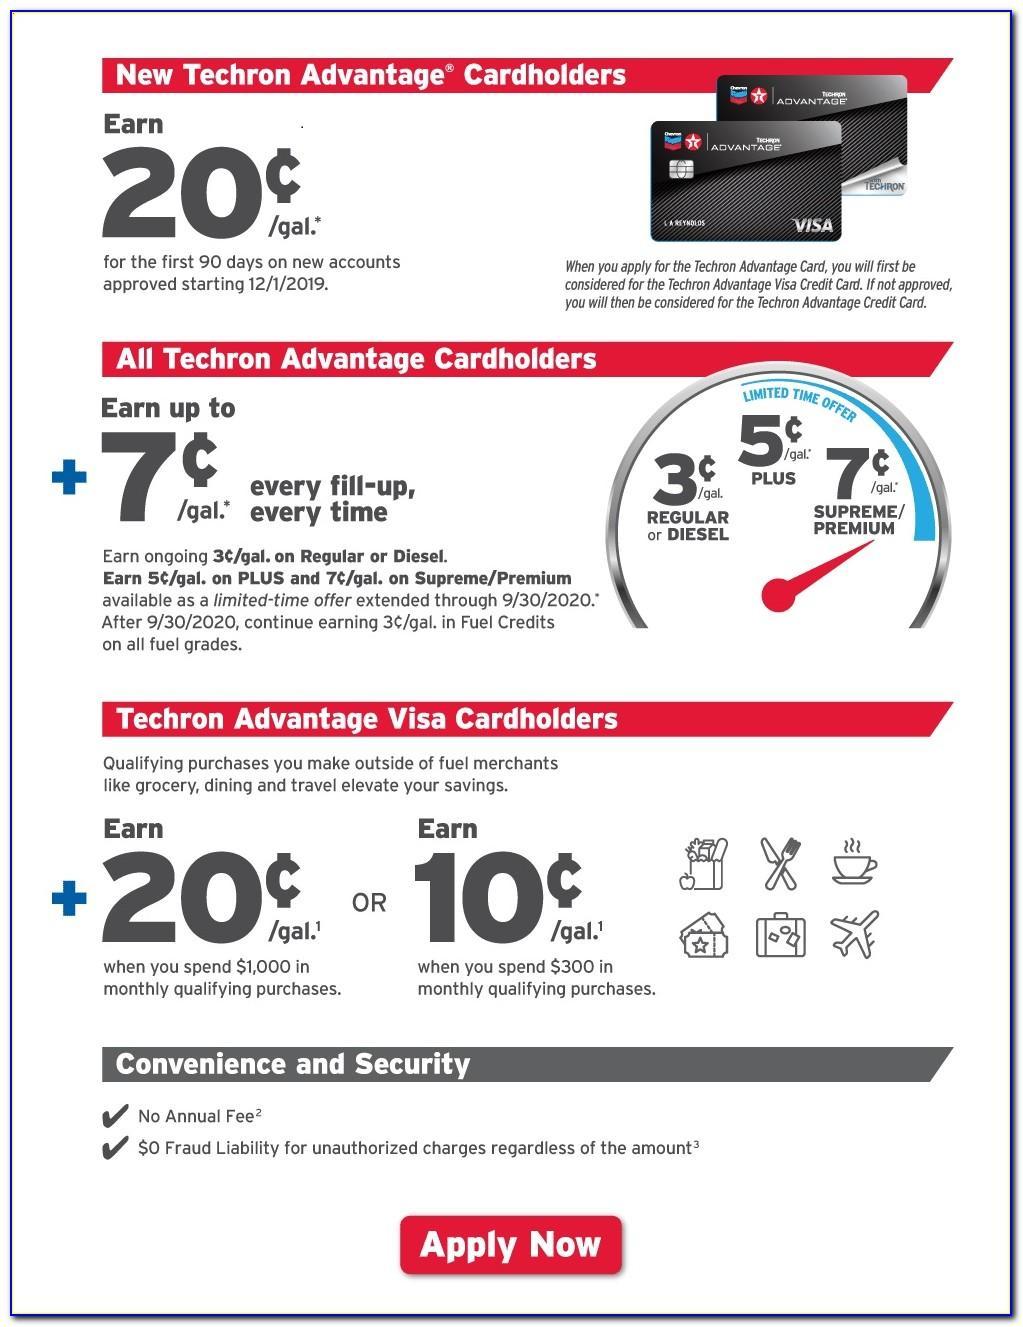 Chevron And Texaco Business Card Contact